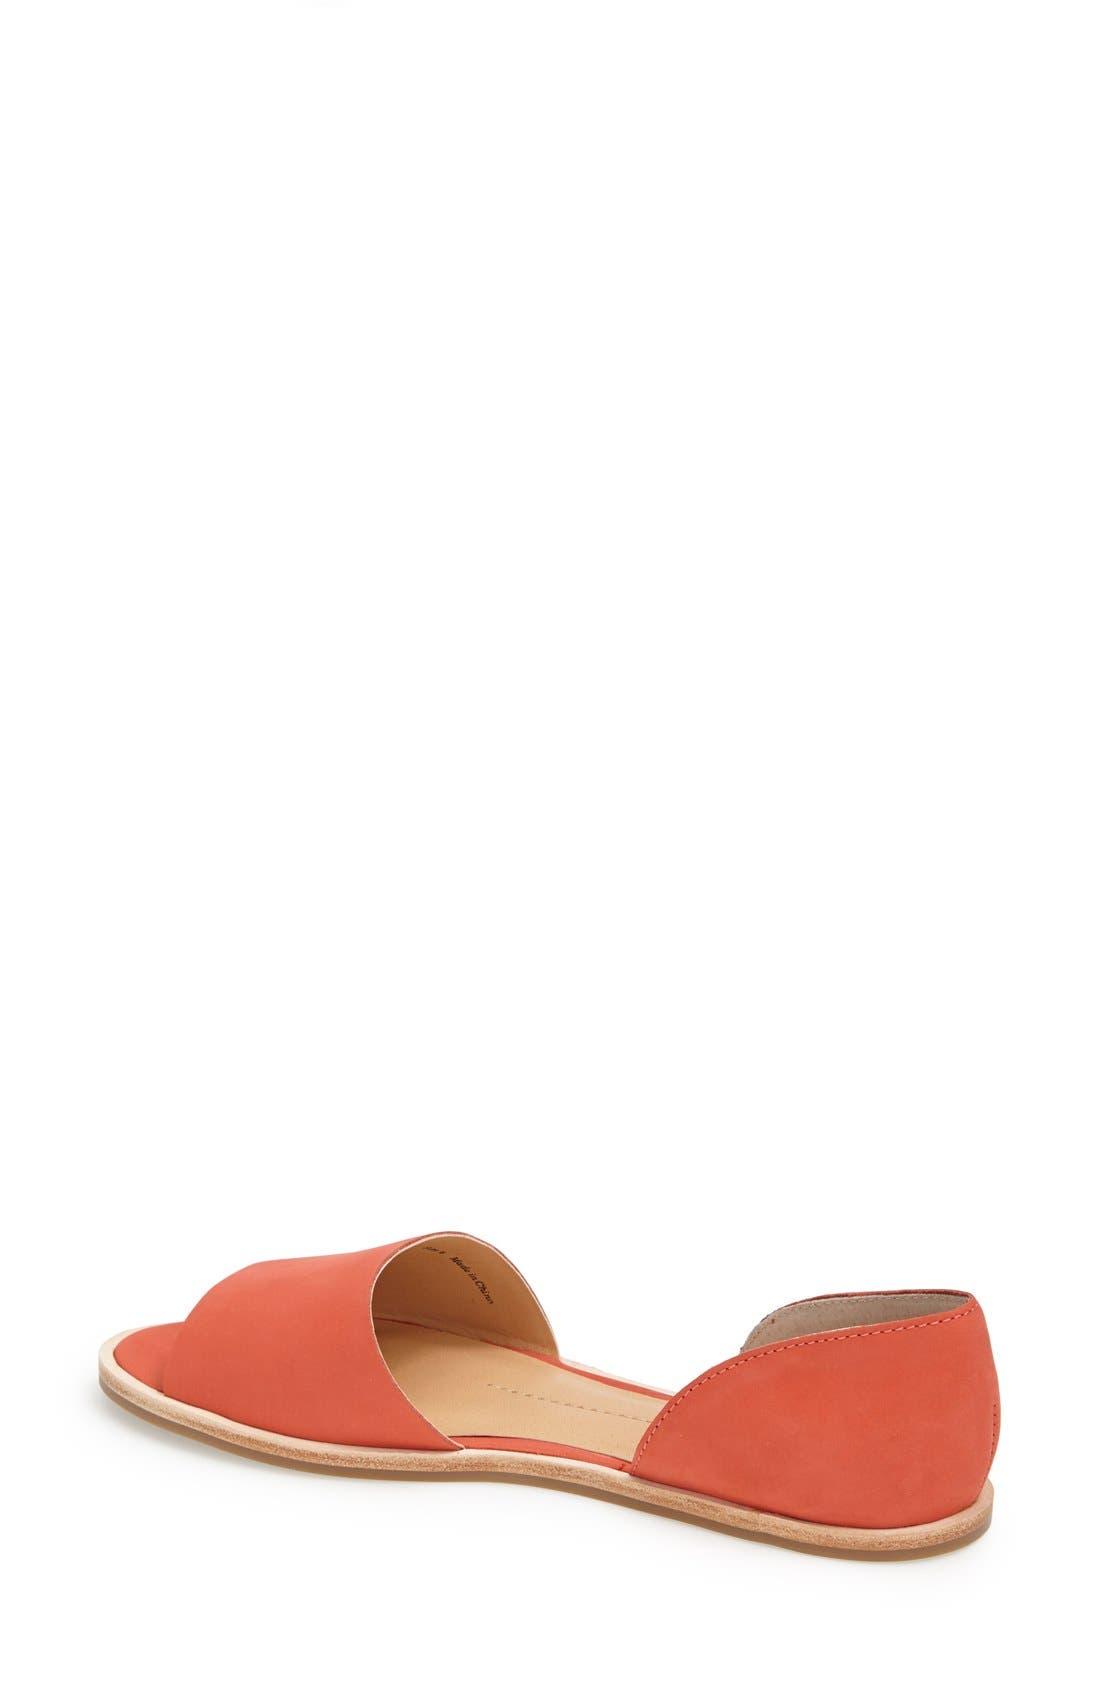 Alternate Image 2  - DV by Dolce Vita 'Datsun' Leather Sandal (Women)